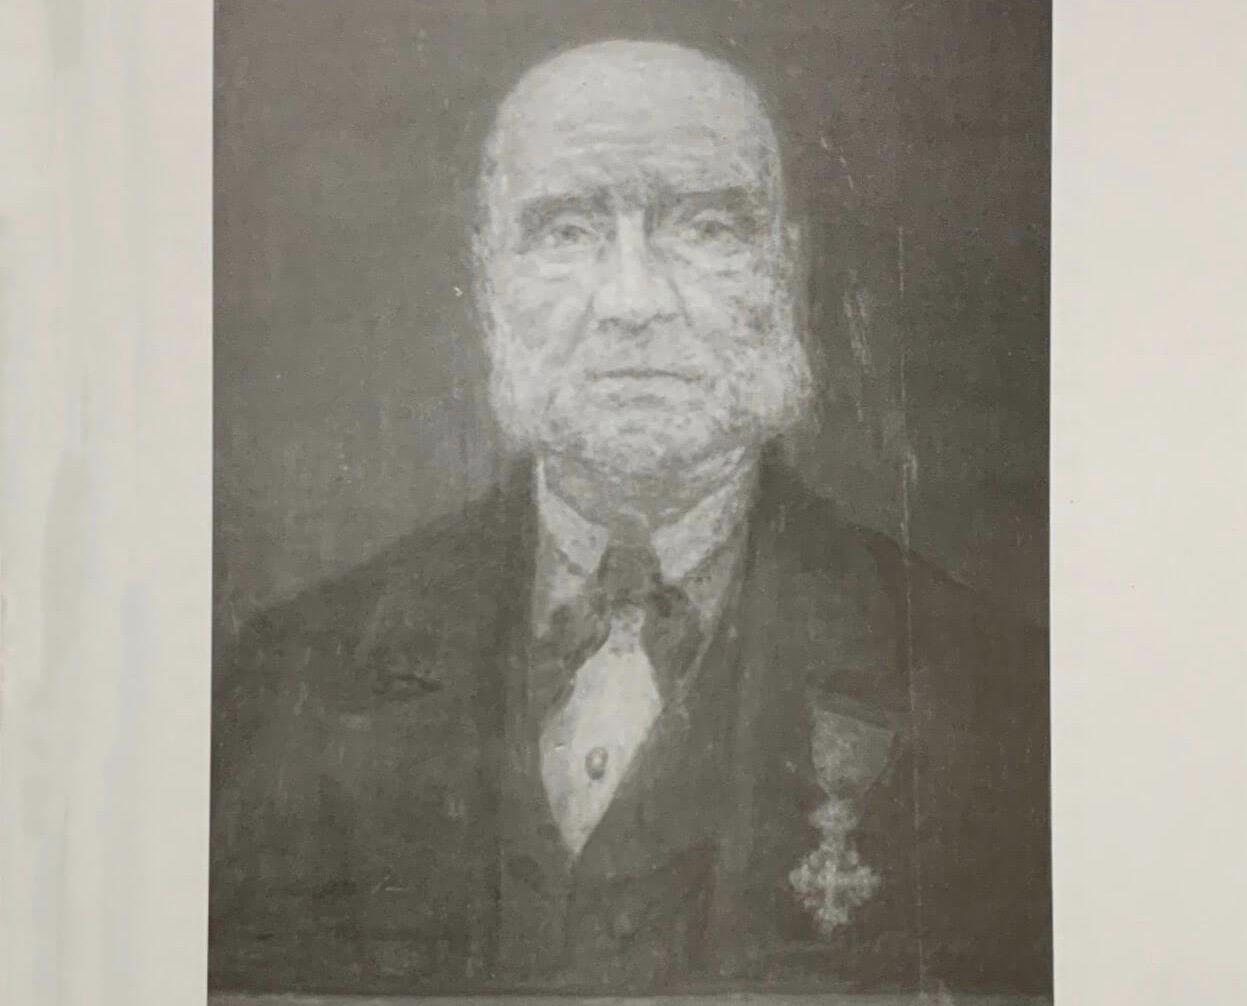 Carlo Gemmellaro: naturalista, geologo e rettore italiano